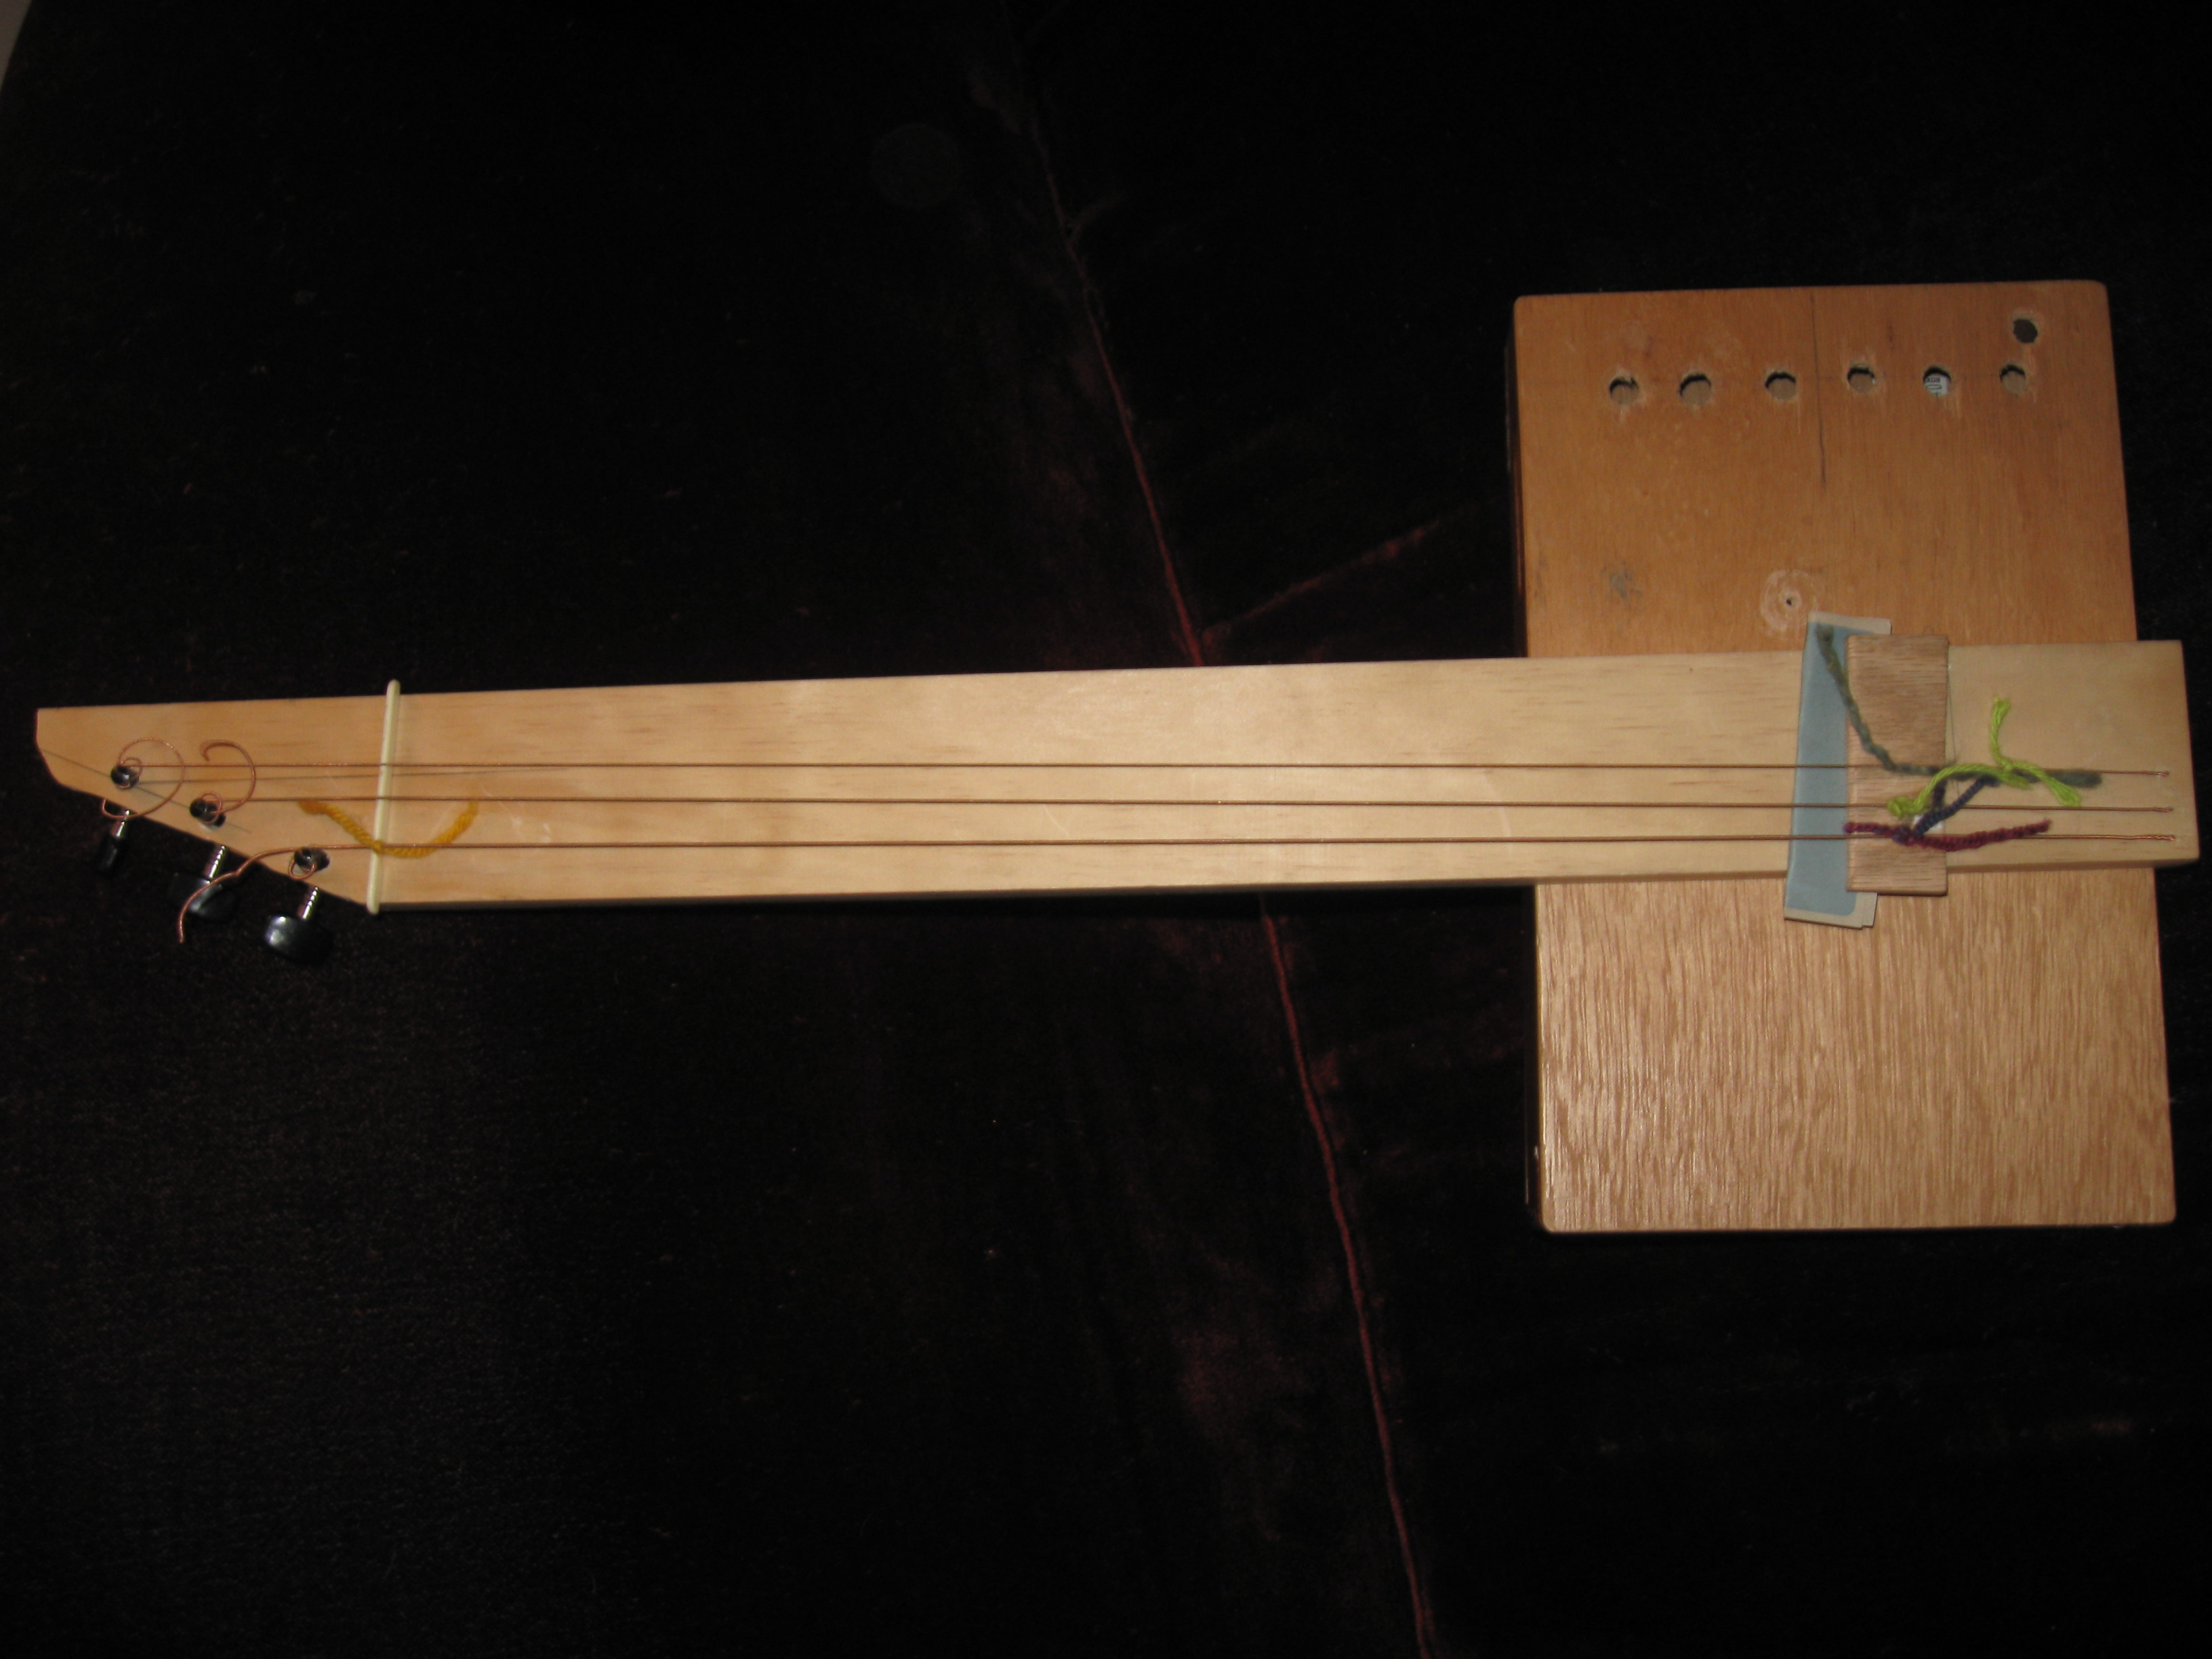 Cigar box sitar (tamboura)